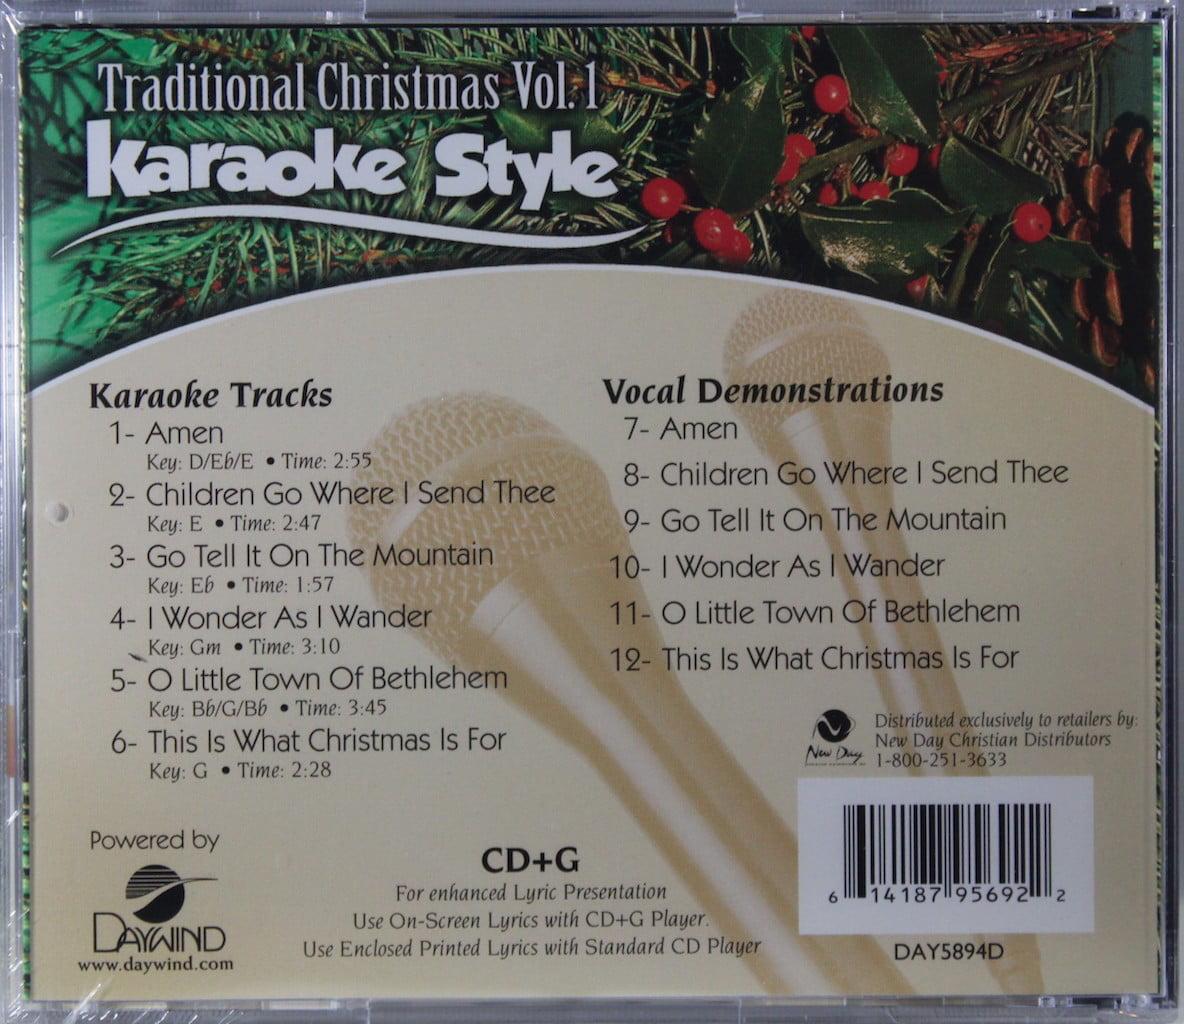 Kids Christmas Volume 1 Christian Karaoke Style New Cd+g Daywind 6 Songs Karaoke Entertainment Musical Instruments & Gear